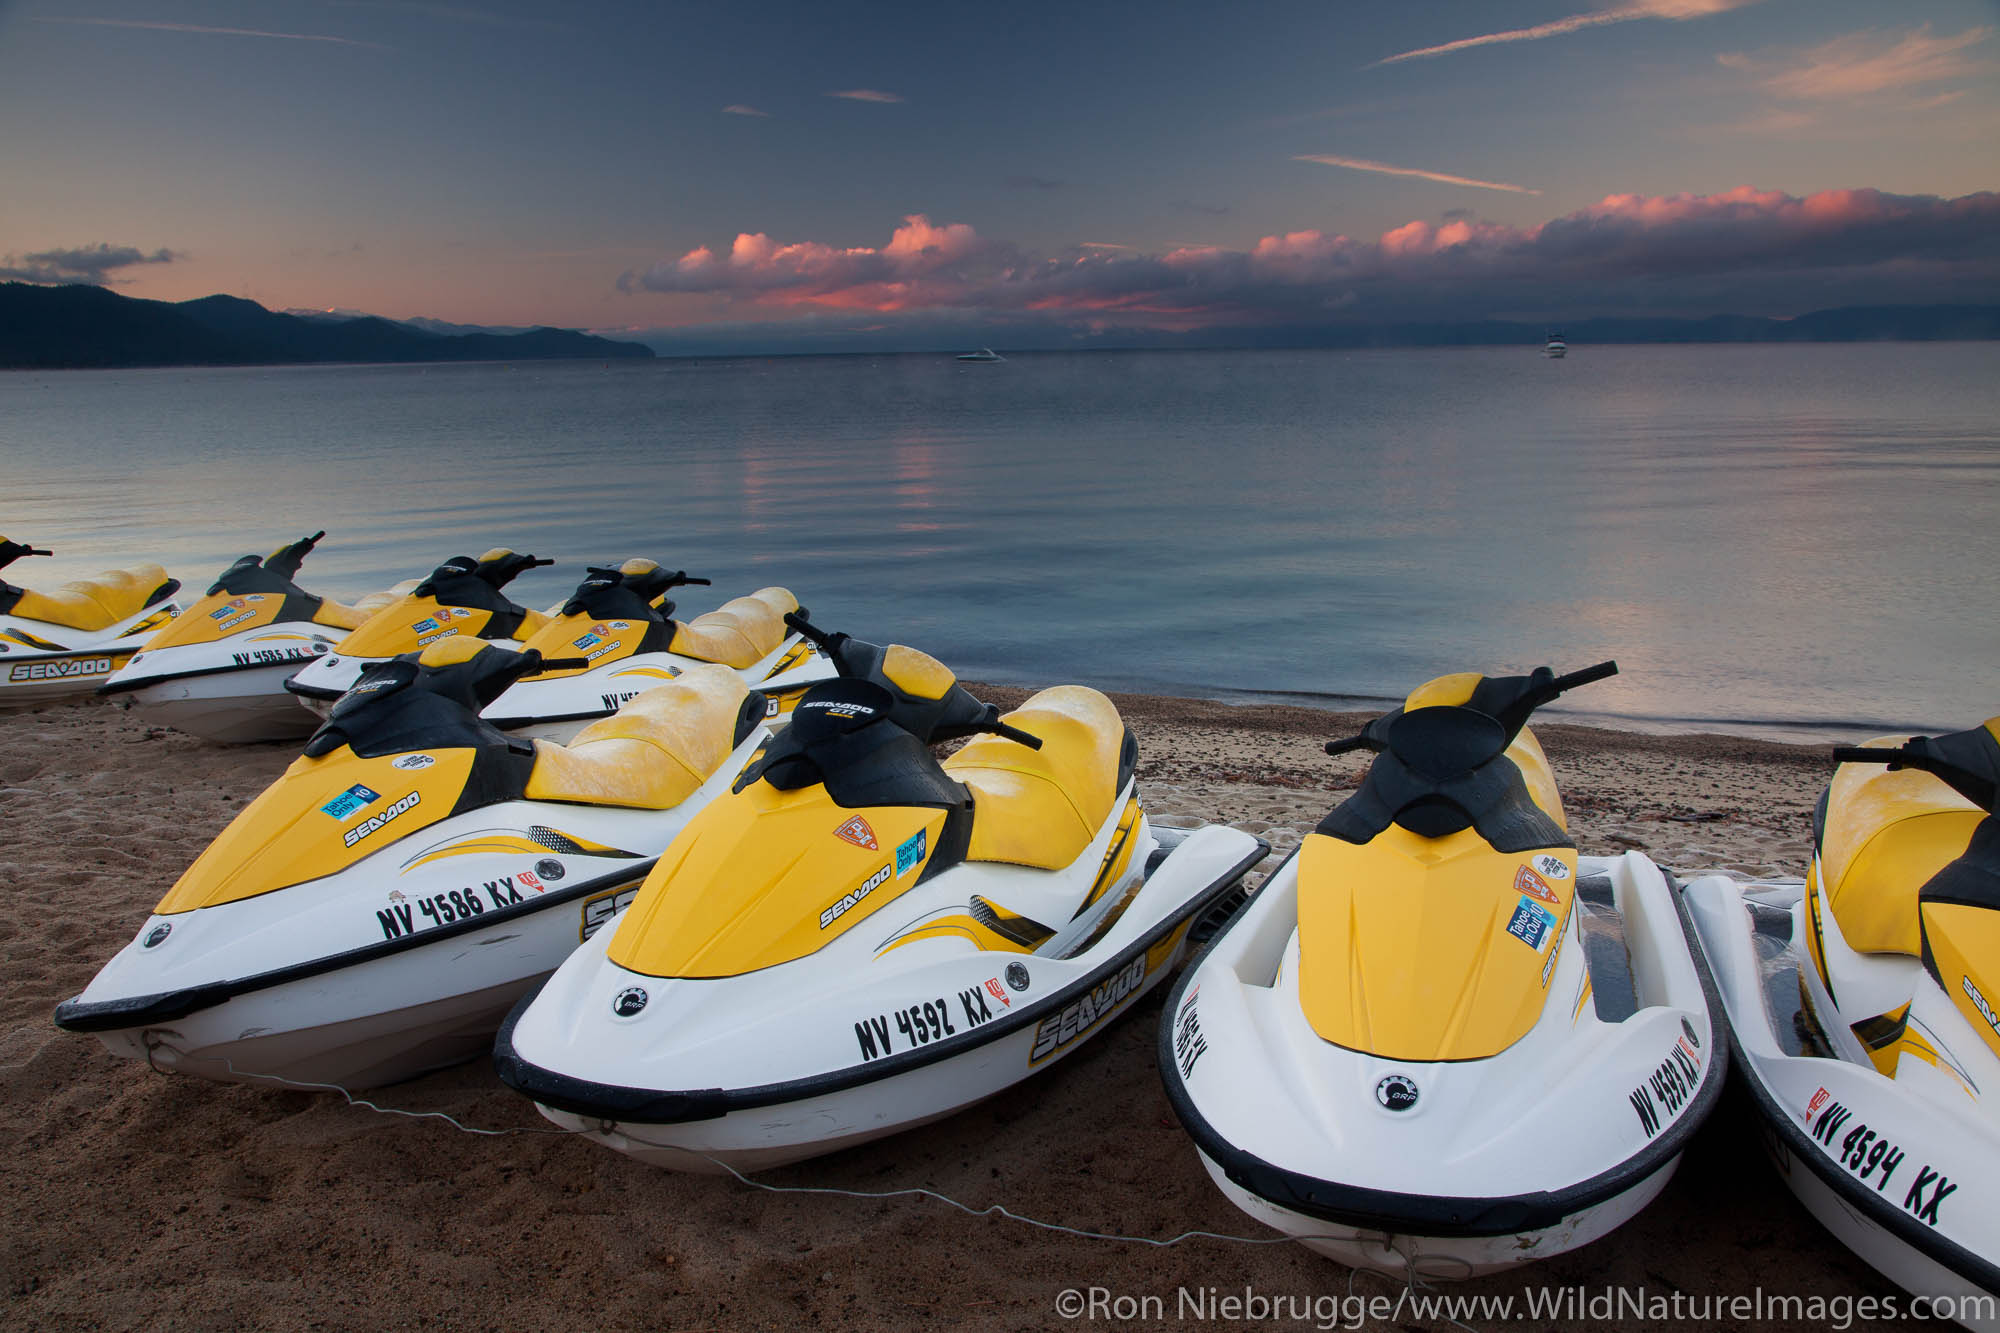 Jet skis on beach at Lake Tahoe, Nevada